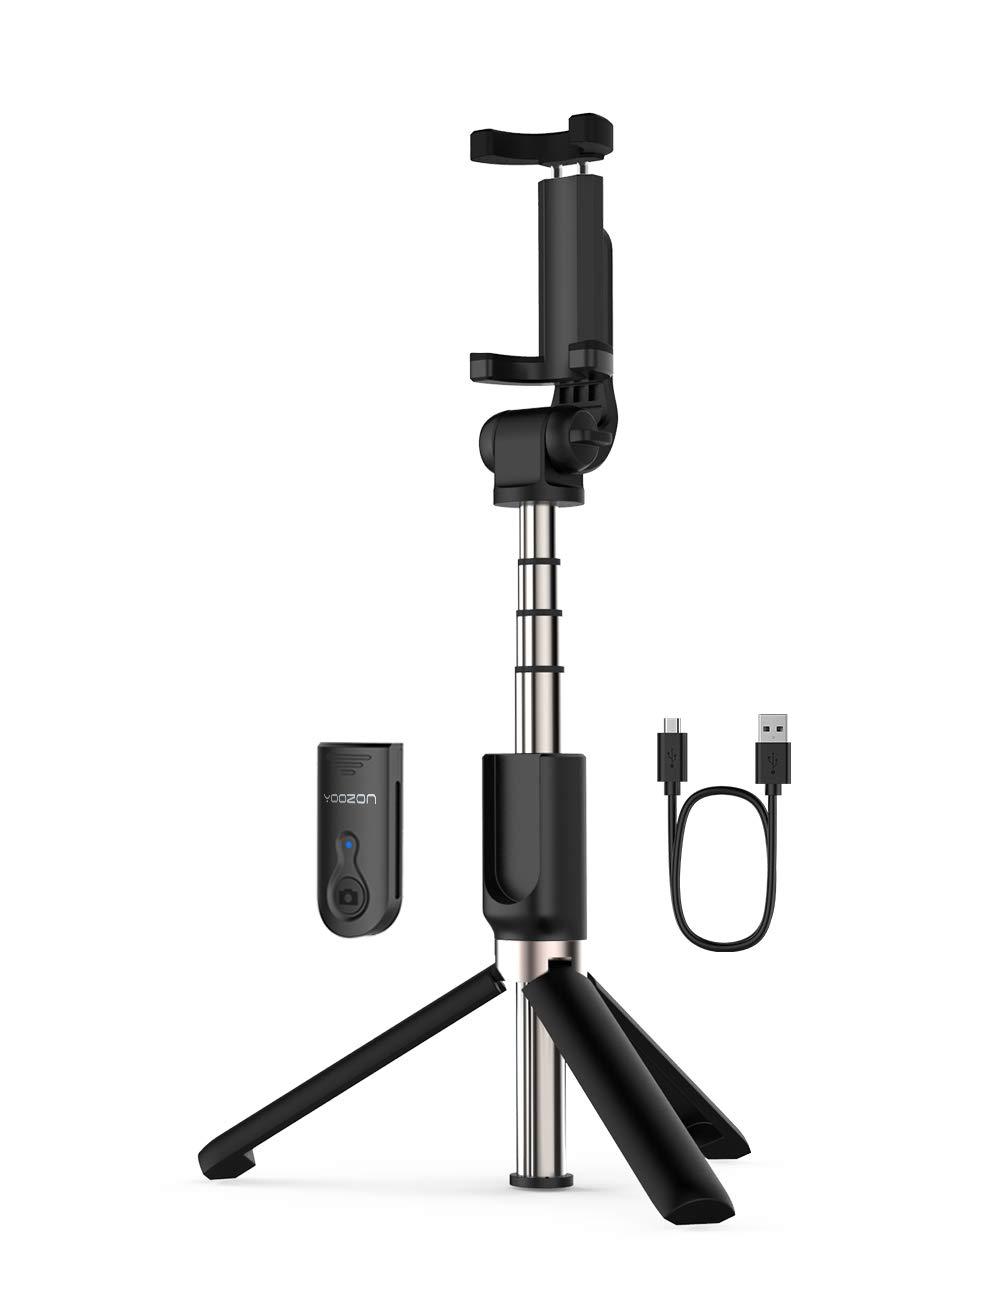 Last Minute Gift Ideas For The Minimalist Digital Nomad selfie stick tripod